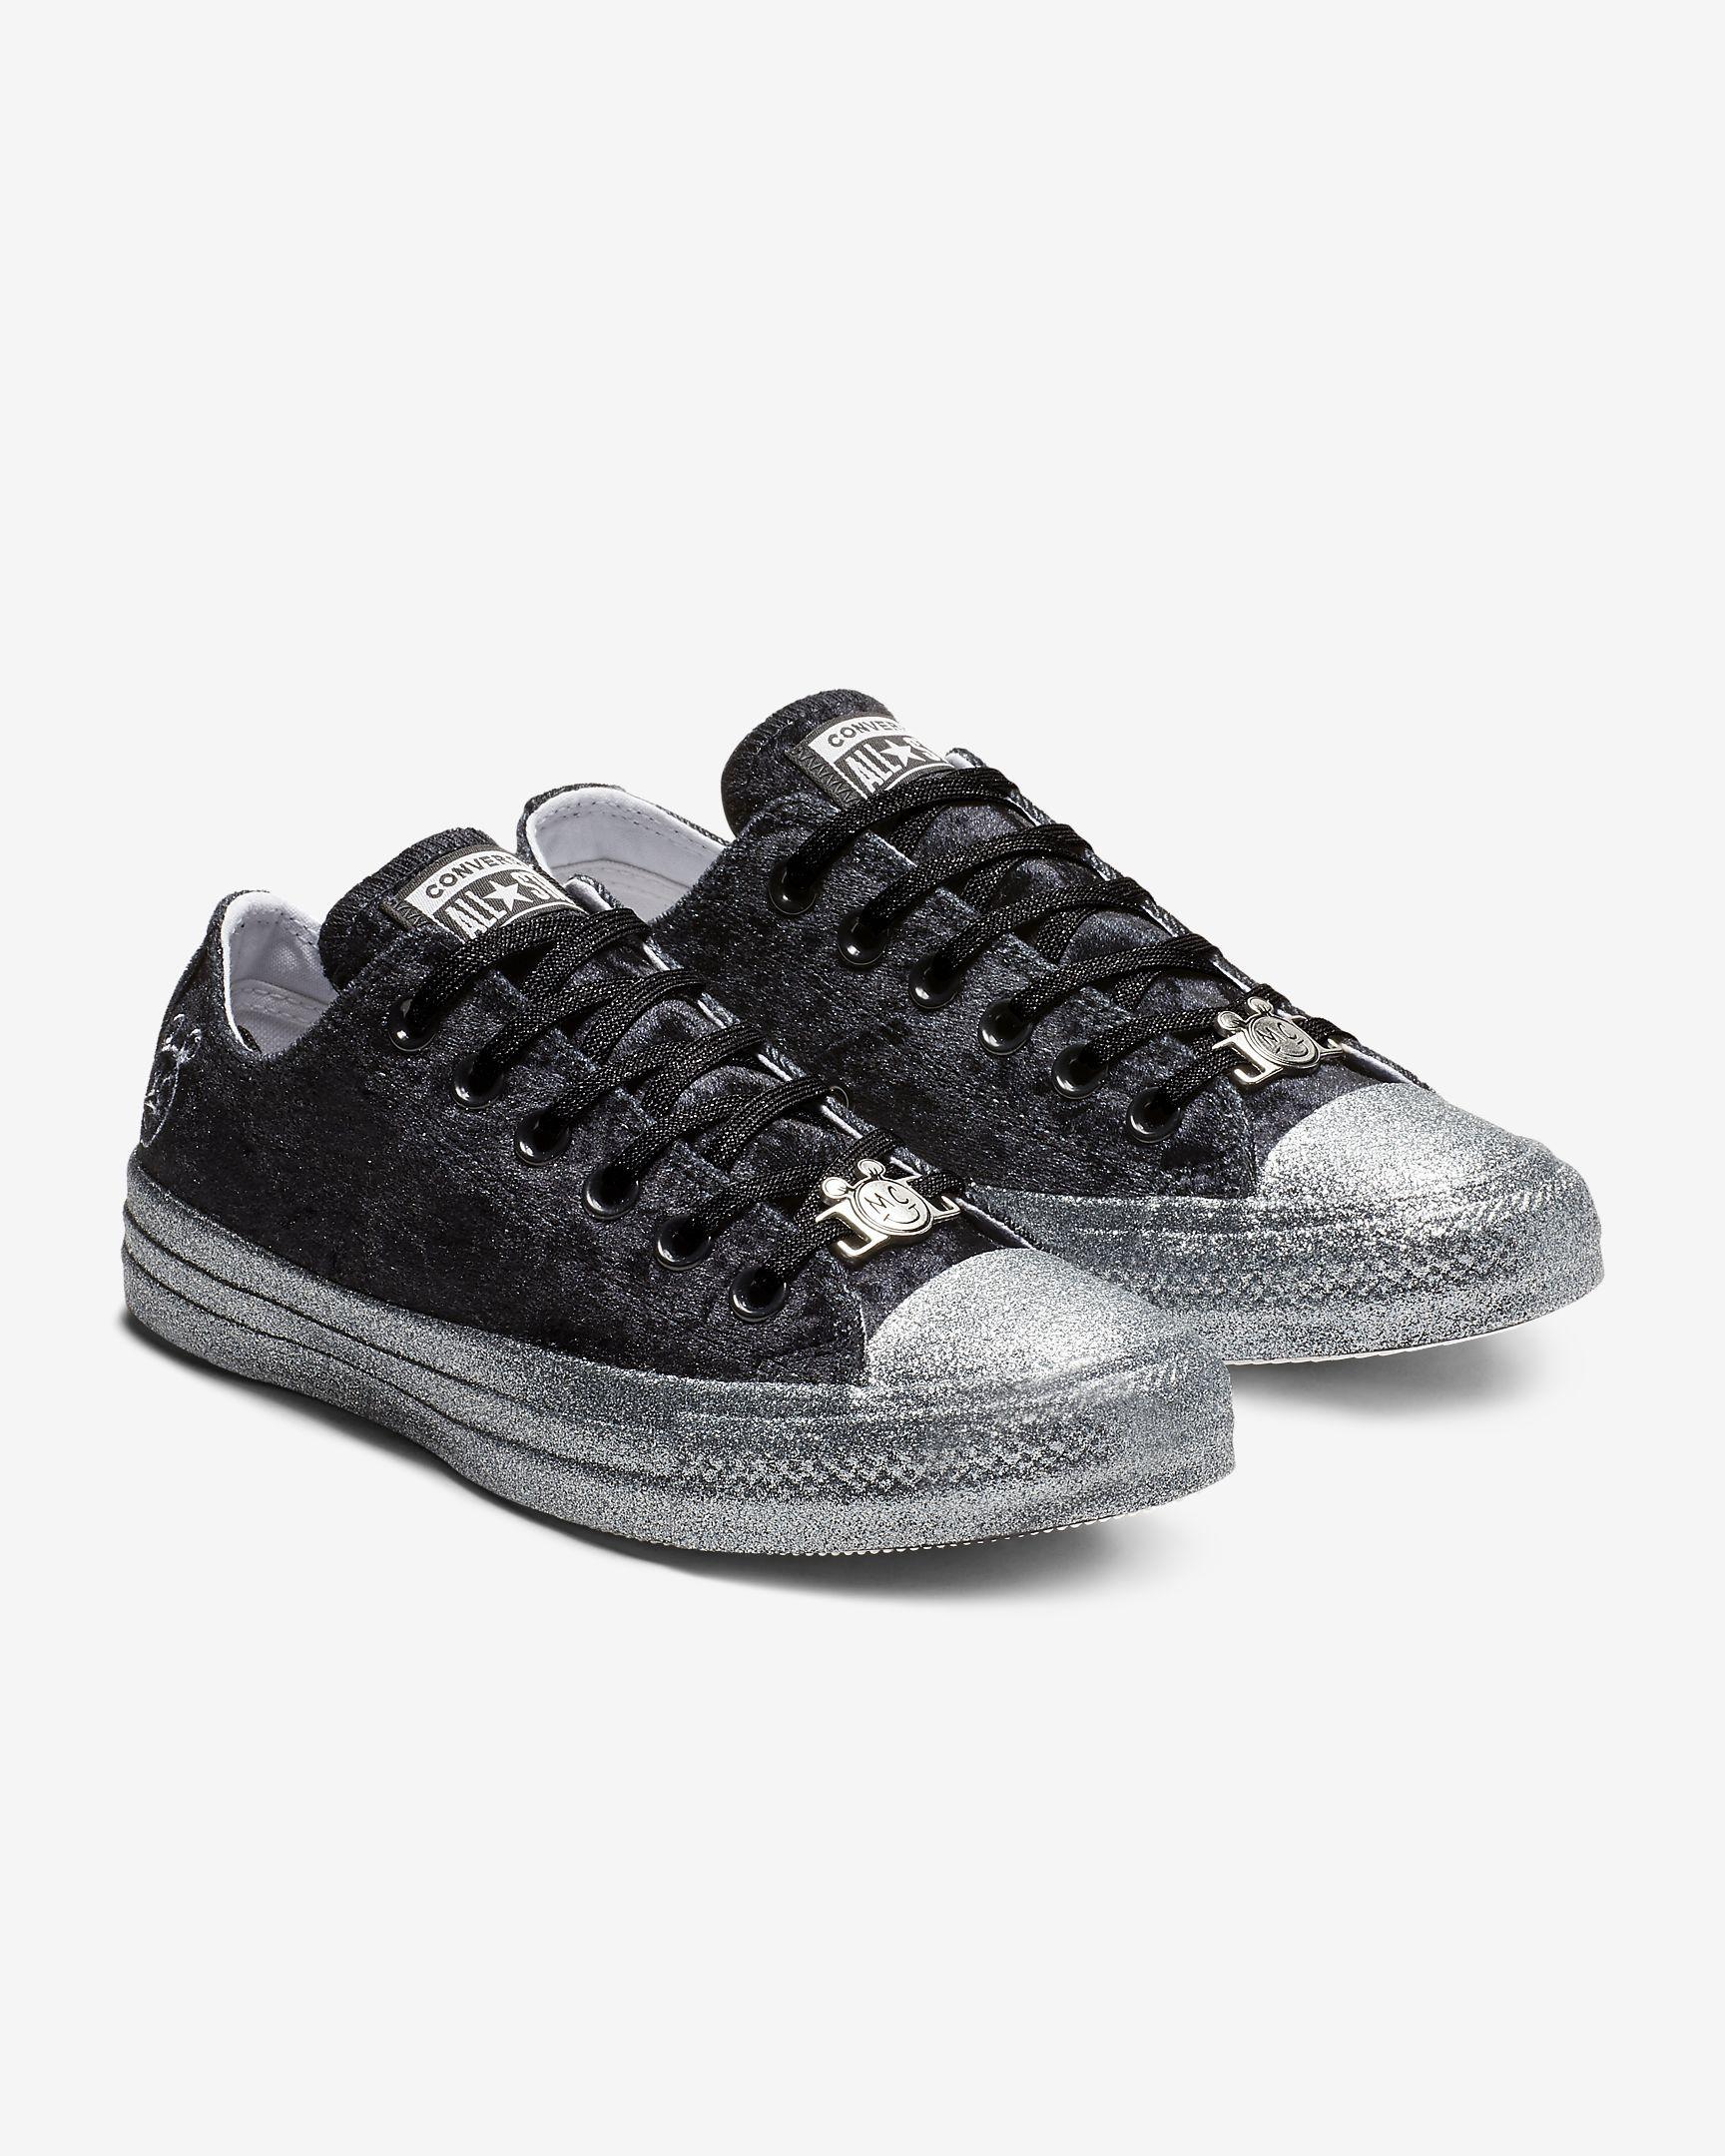 9ac37374932 Converse x Miley Cyrus Chuck Taylor All Star Velvet Low Top Women s Shoe